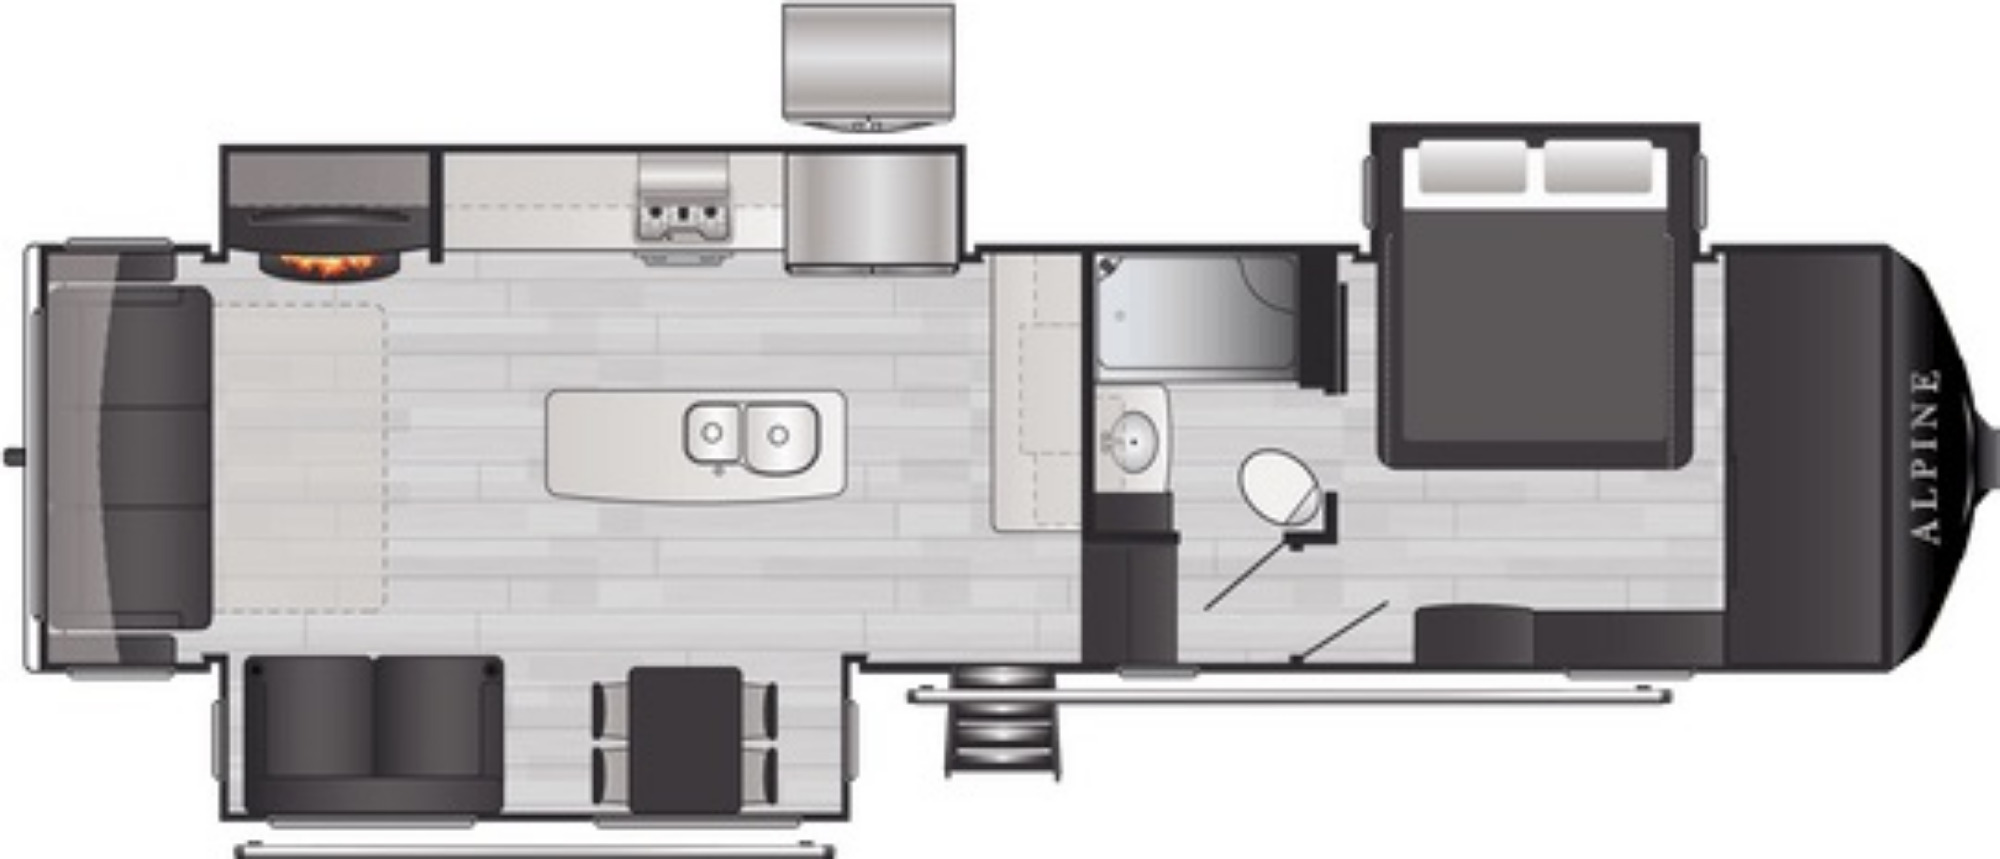 View Floor Plan for 2021 KEYSTONE ALPINE 3220RL